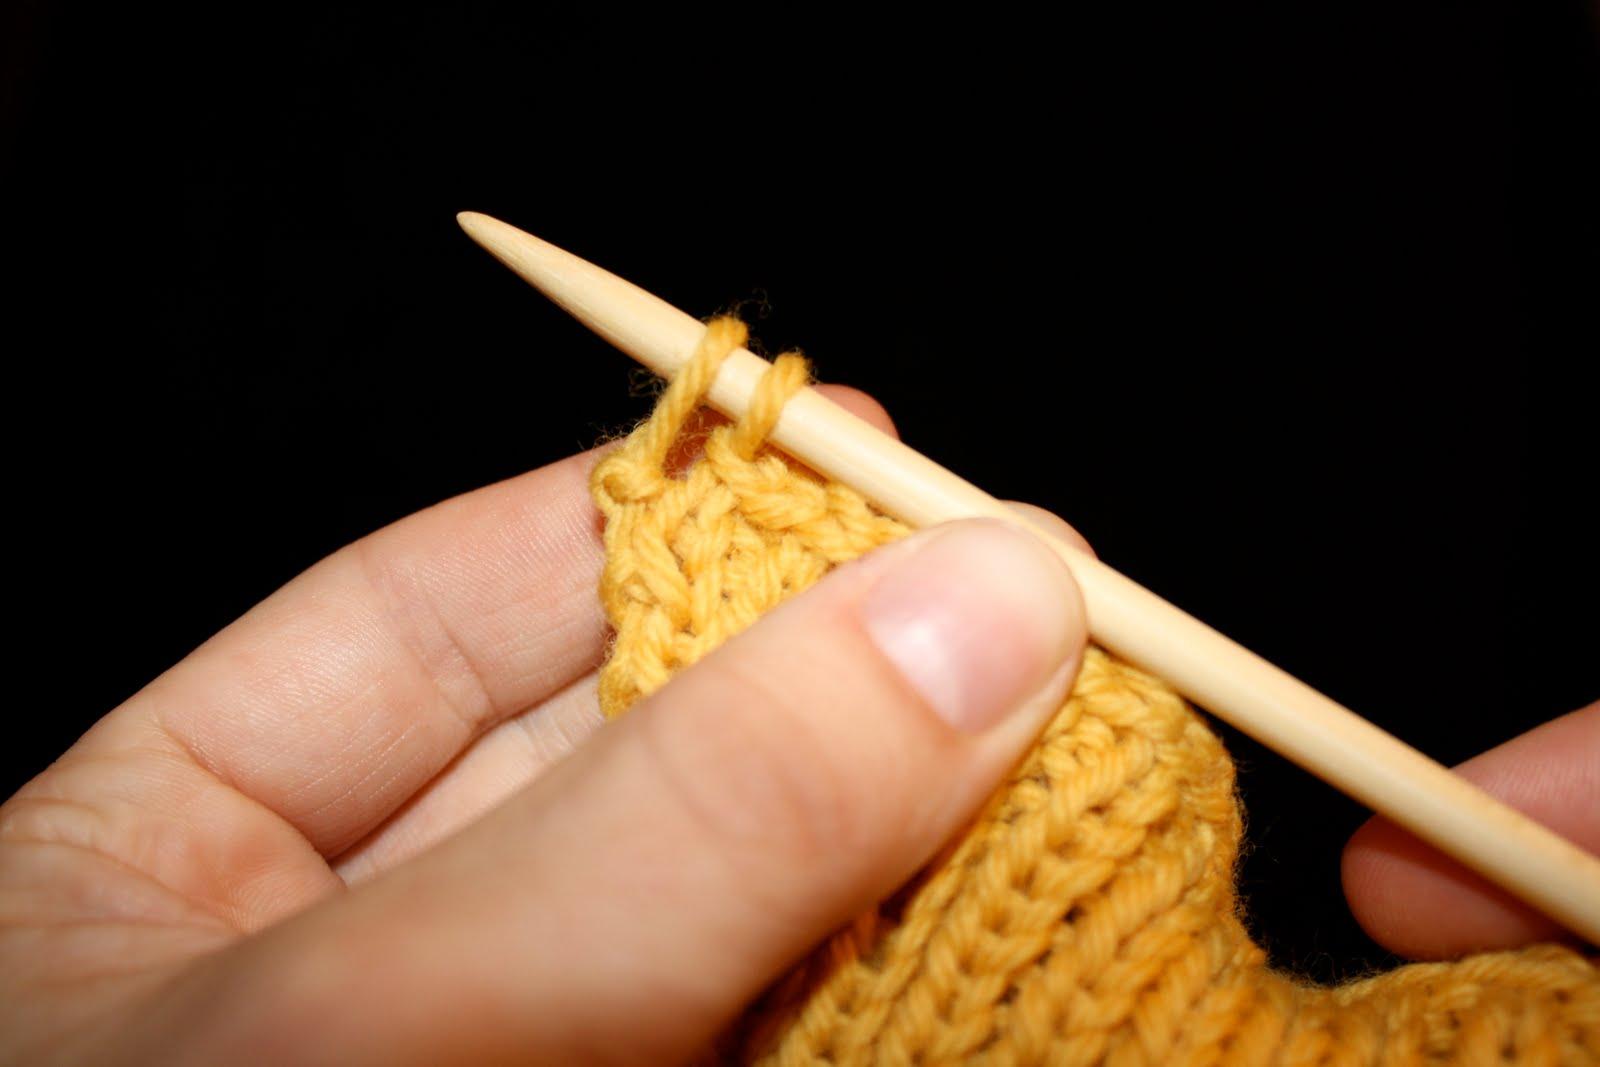 Knitting Binding Off Last Stitch : AC Engineered Knits: Knit bind-off: last stitch boogaloo